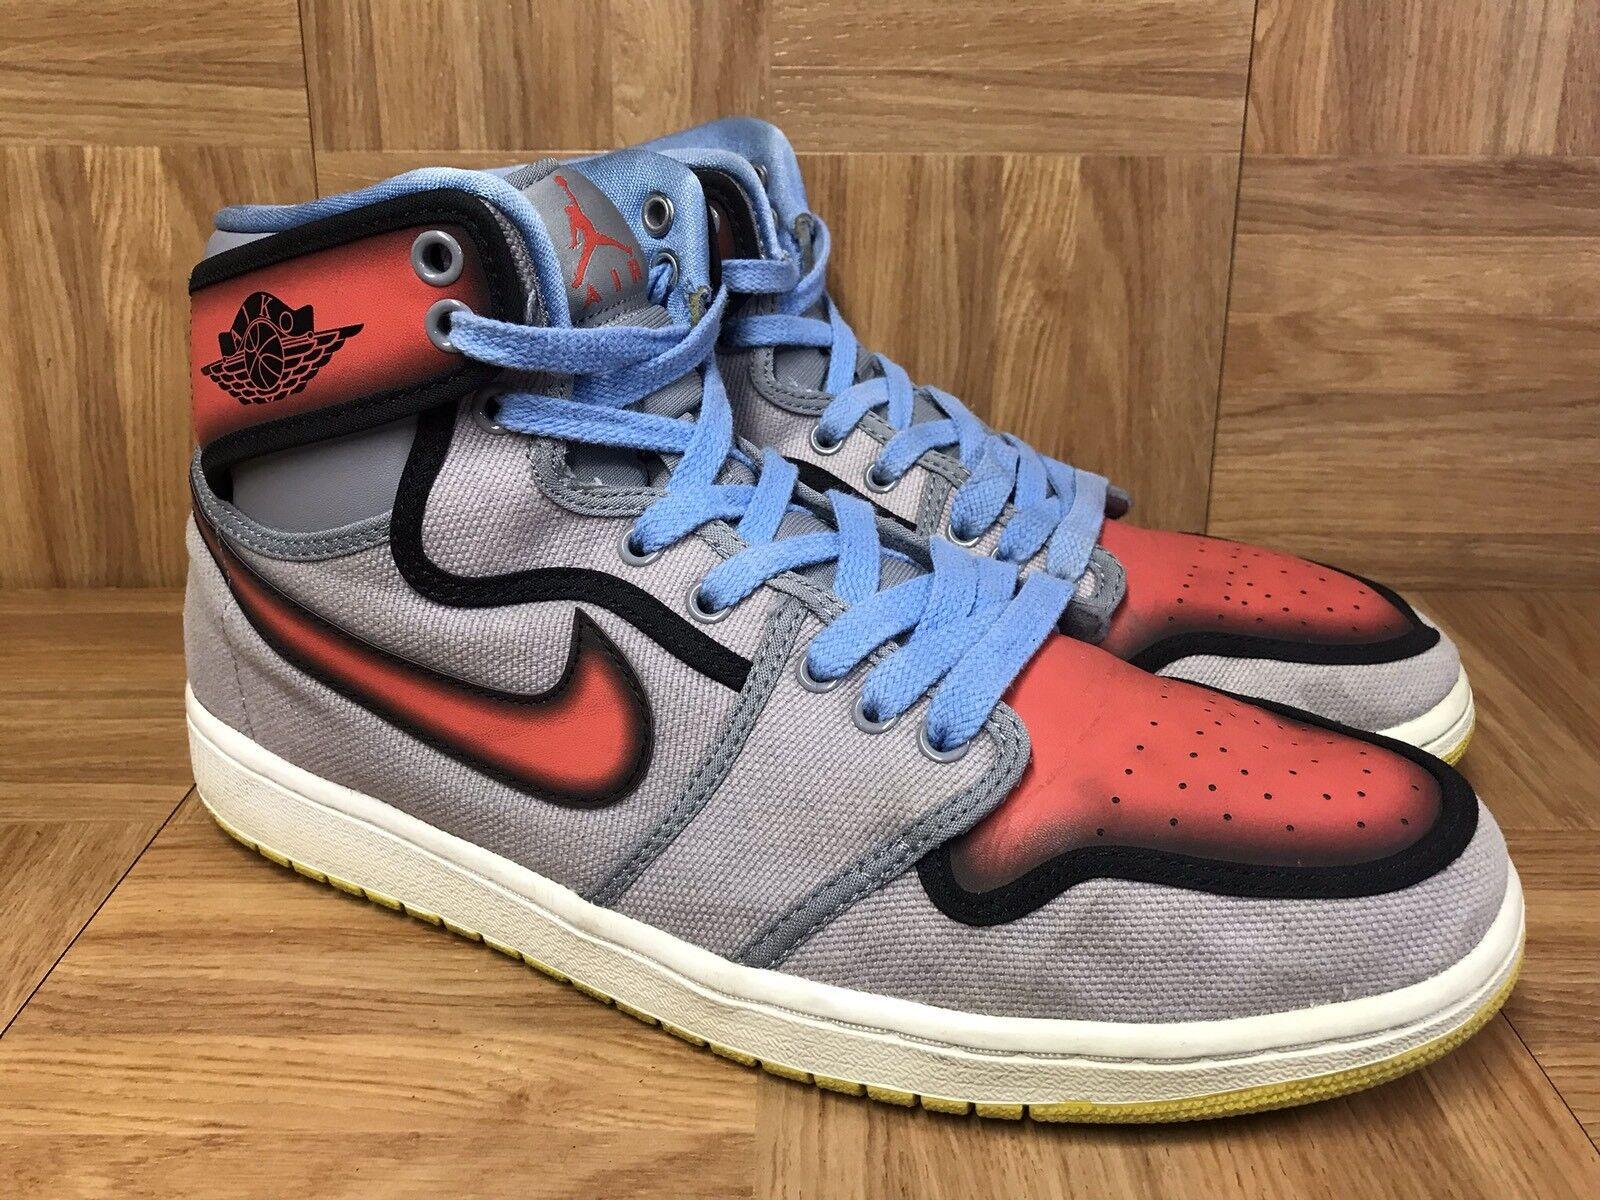 RARE  Nike Air Jordan 1 Retro AJKO RTTG Sunburst Blu Barcelona Sz 12 539541-035